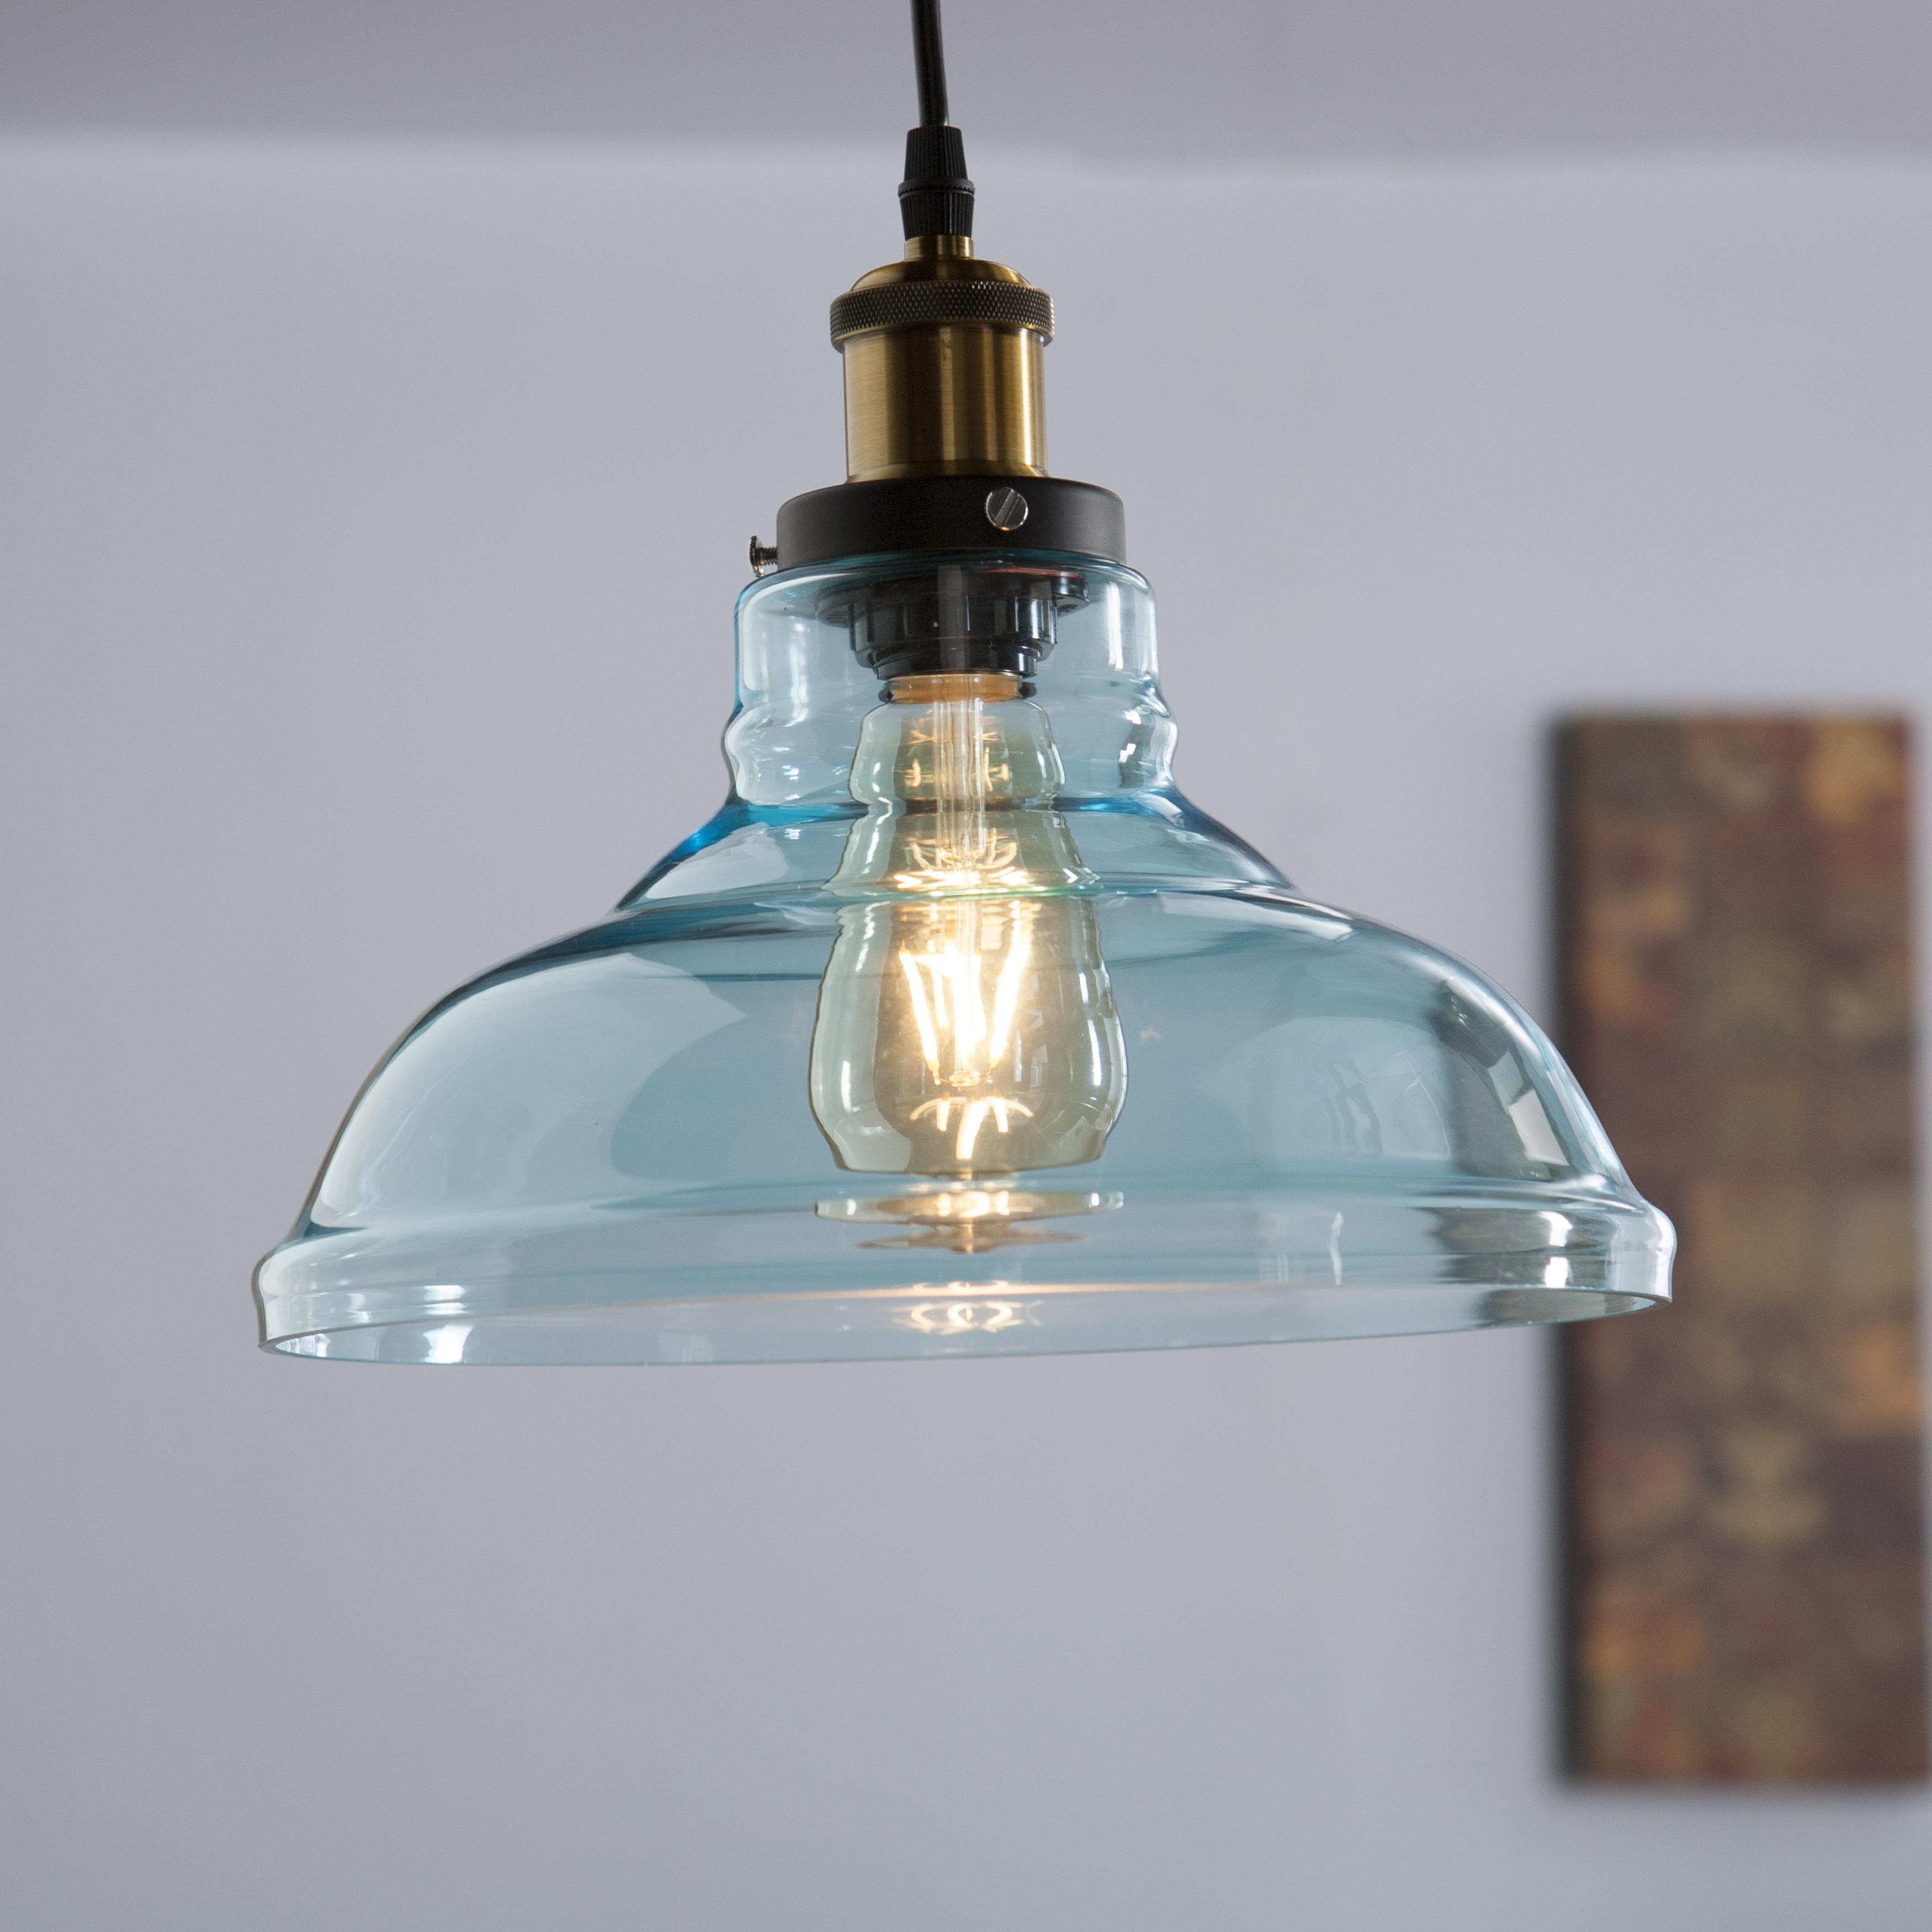 Harper blvd gracie colored glass bell pendant lamp soft aqua